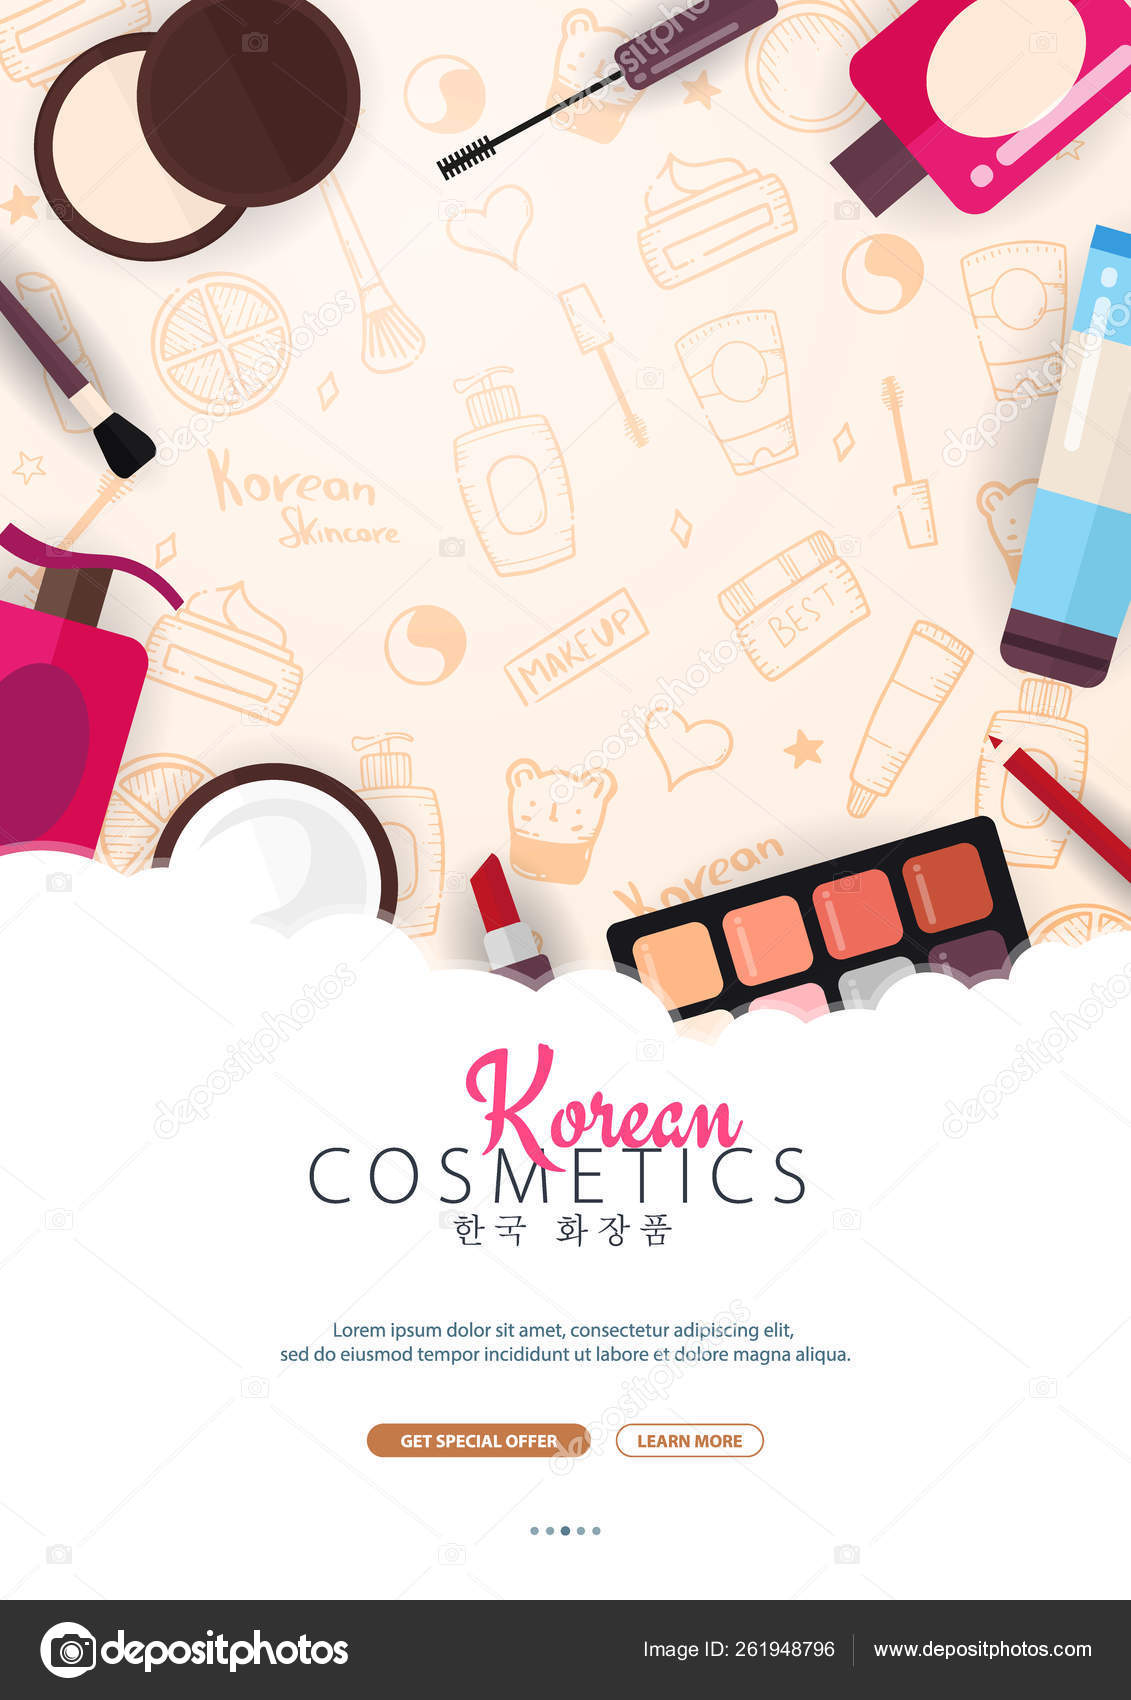 Korean Flat Cosmetics K Beauty Banner With Hand Draw Doodle Background Skincare And Makeup Translation Korean Cosmetics Vector Illustration Stock Vector C Leo Design 261948796